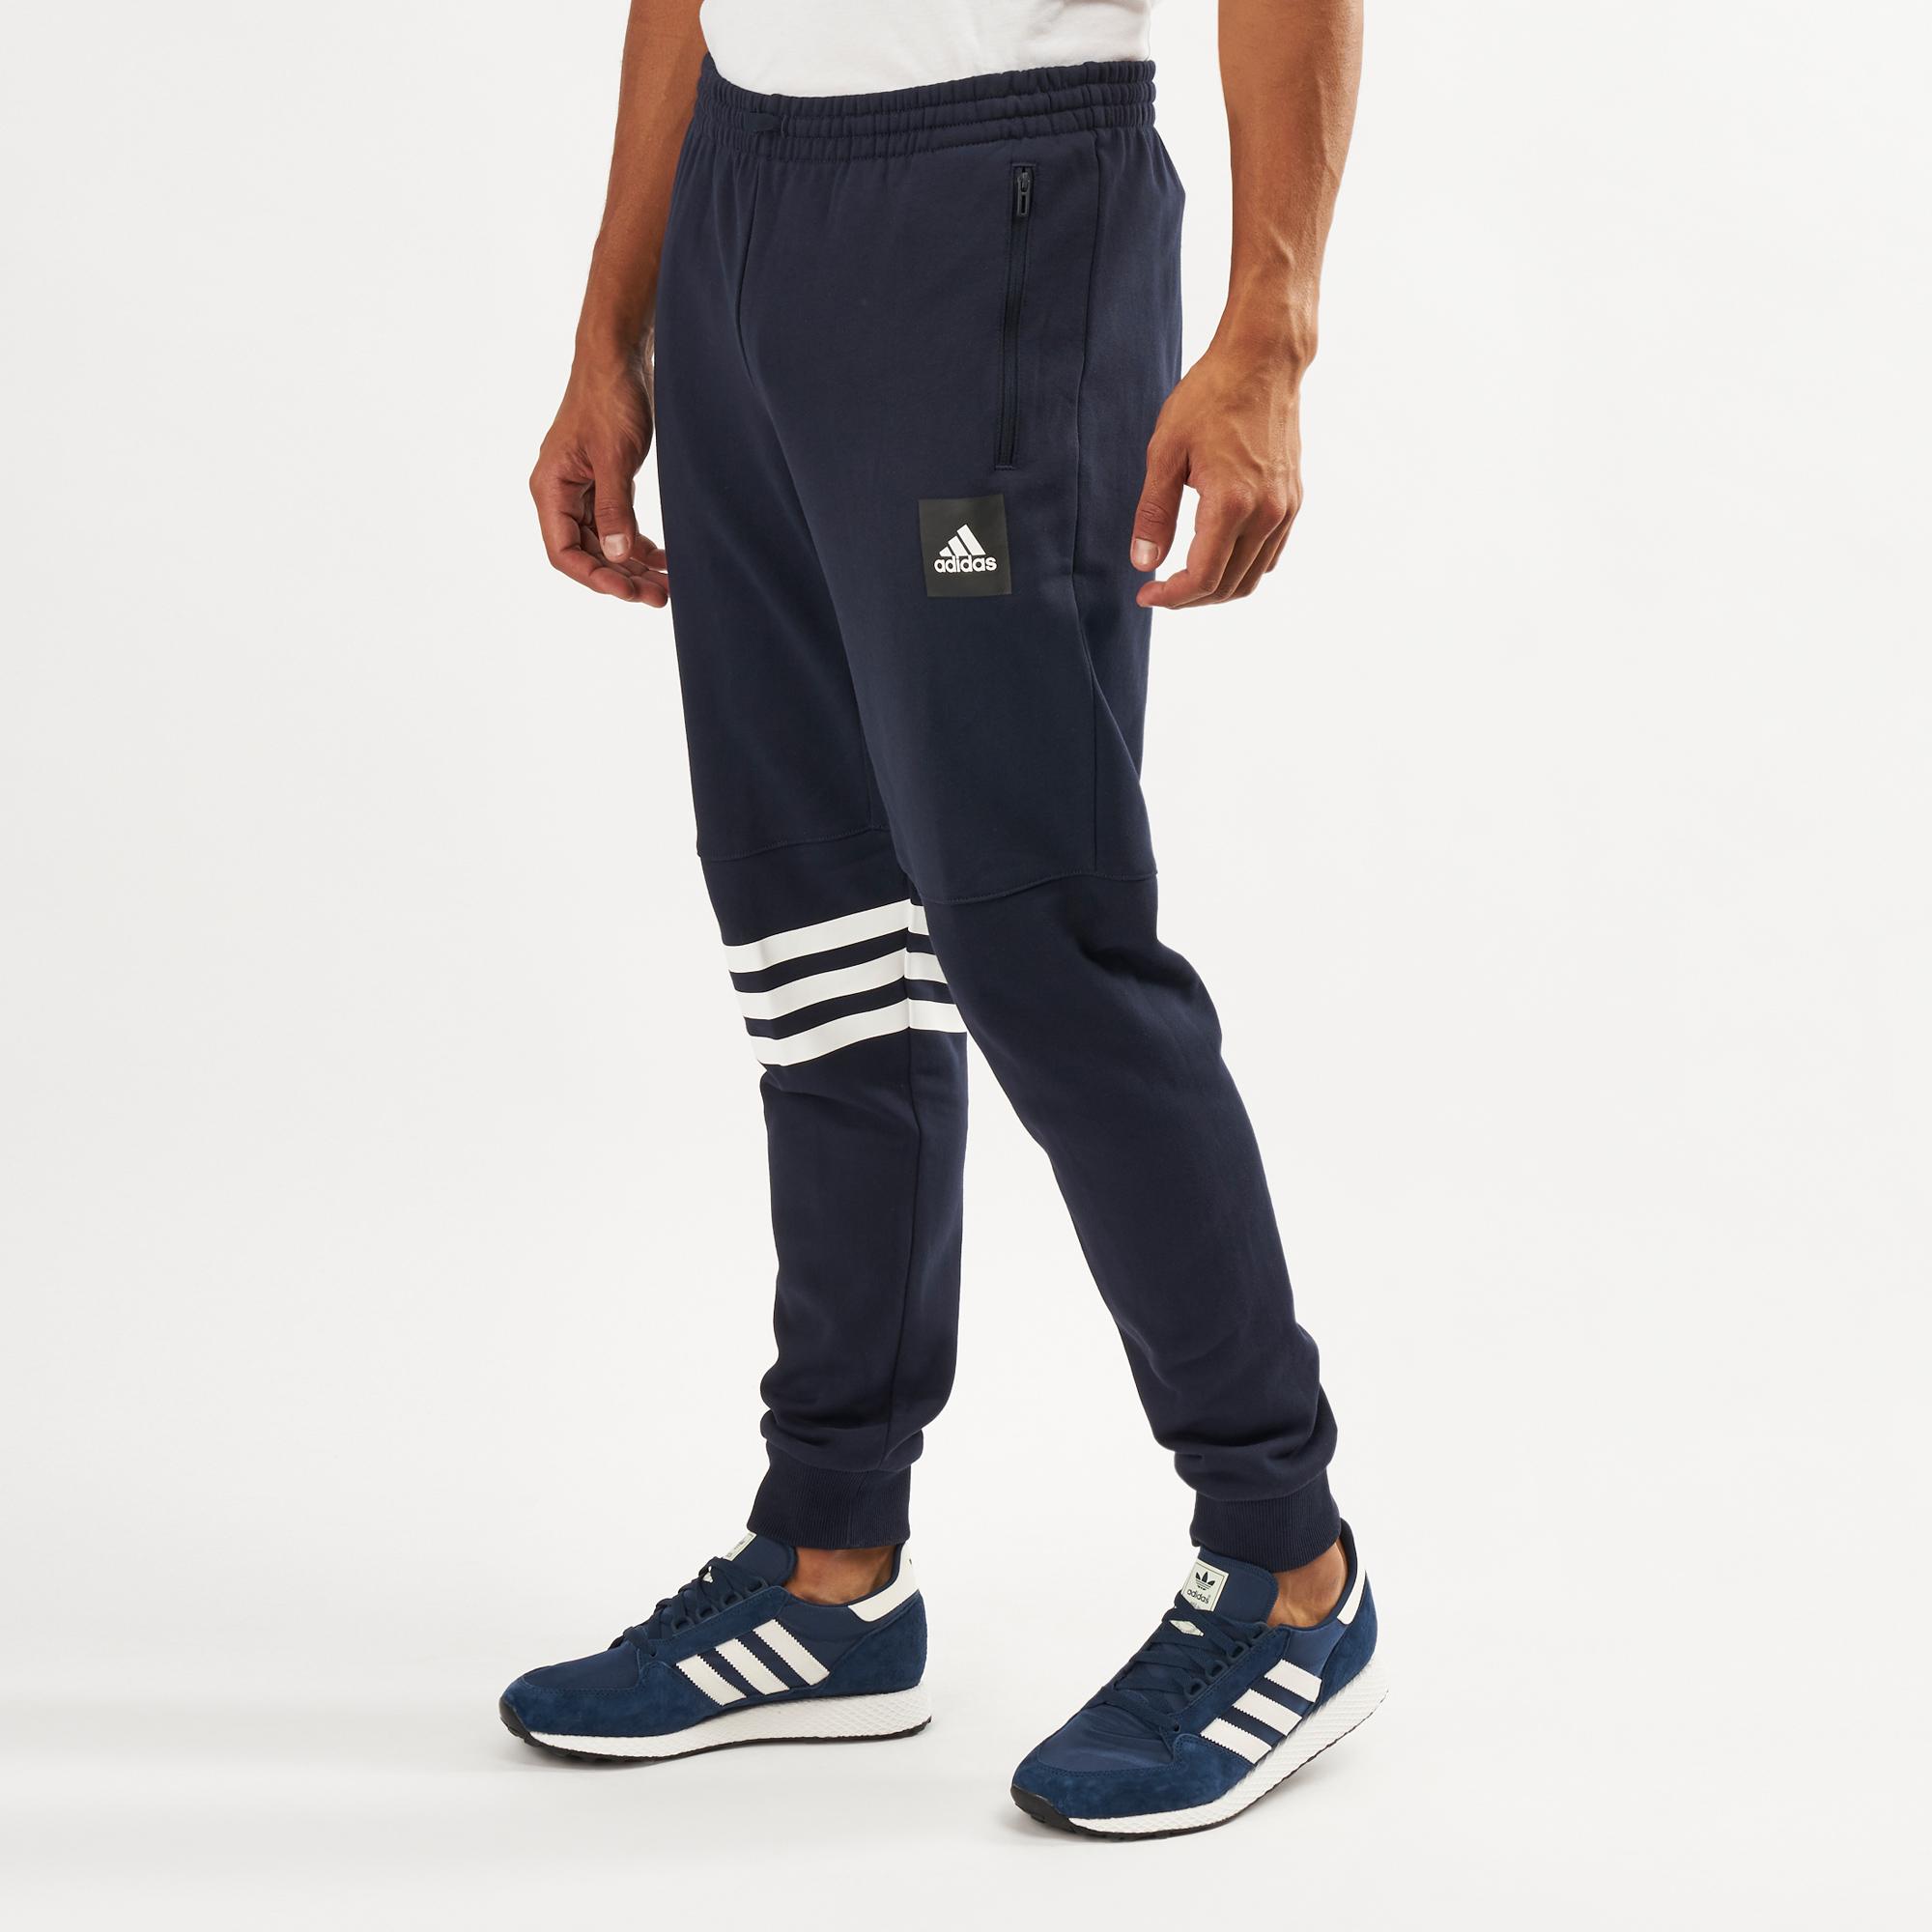 27a53a0c adidas Men's Fat Terry Track Pants | Track Pants | Pants | Clothing | Mens  | | SSS